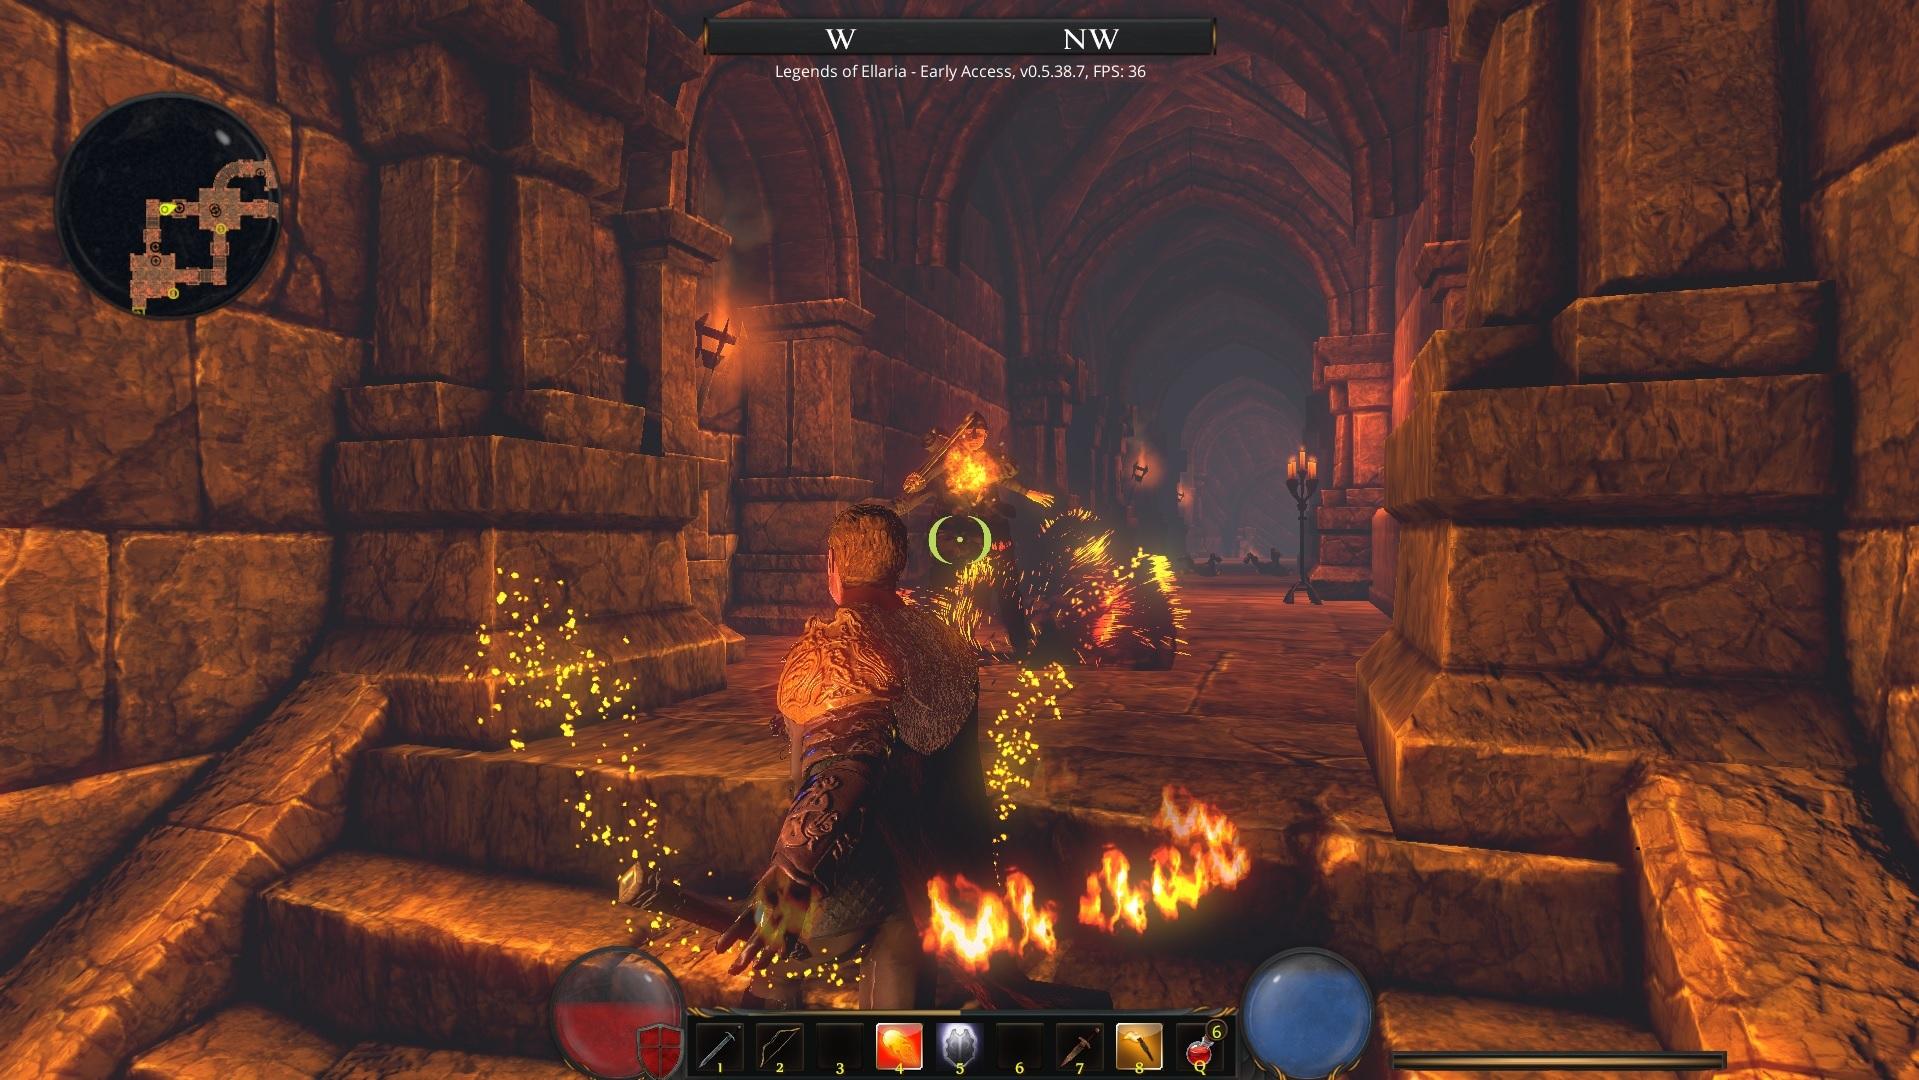 Legends of Ellaria on Steam